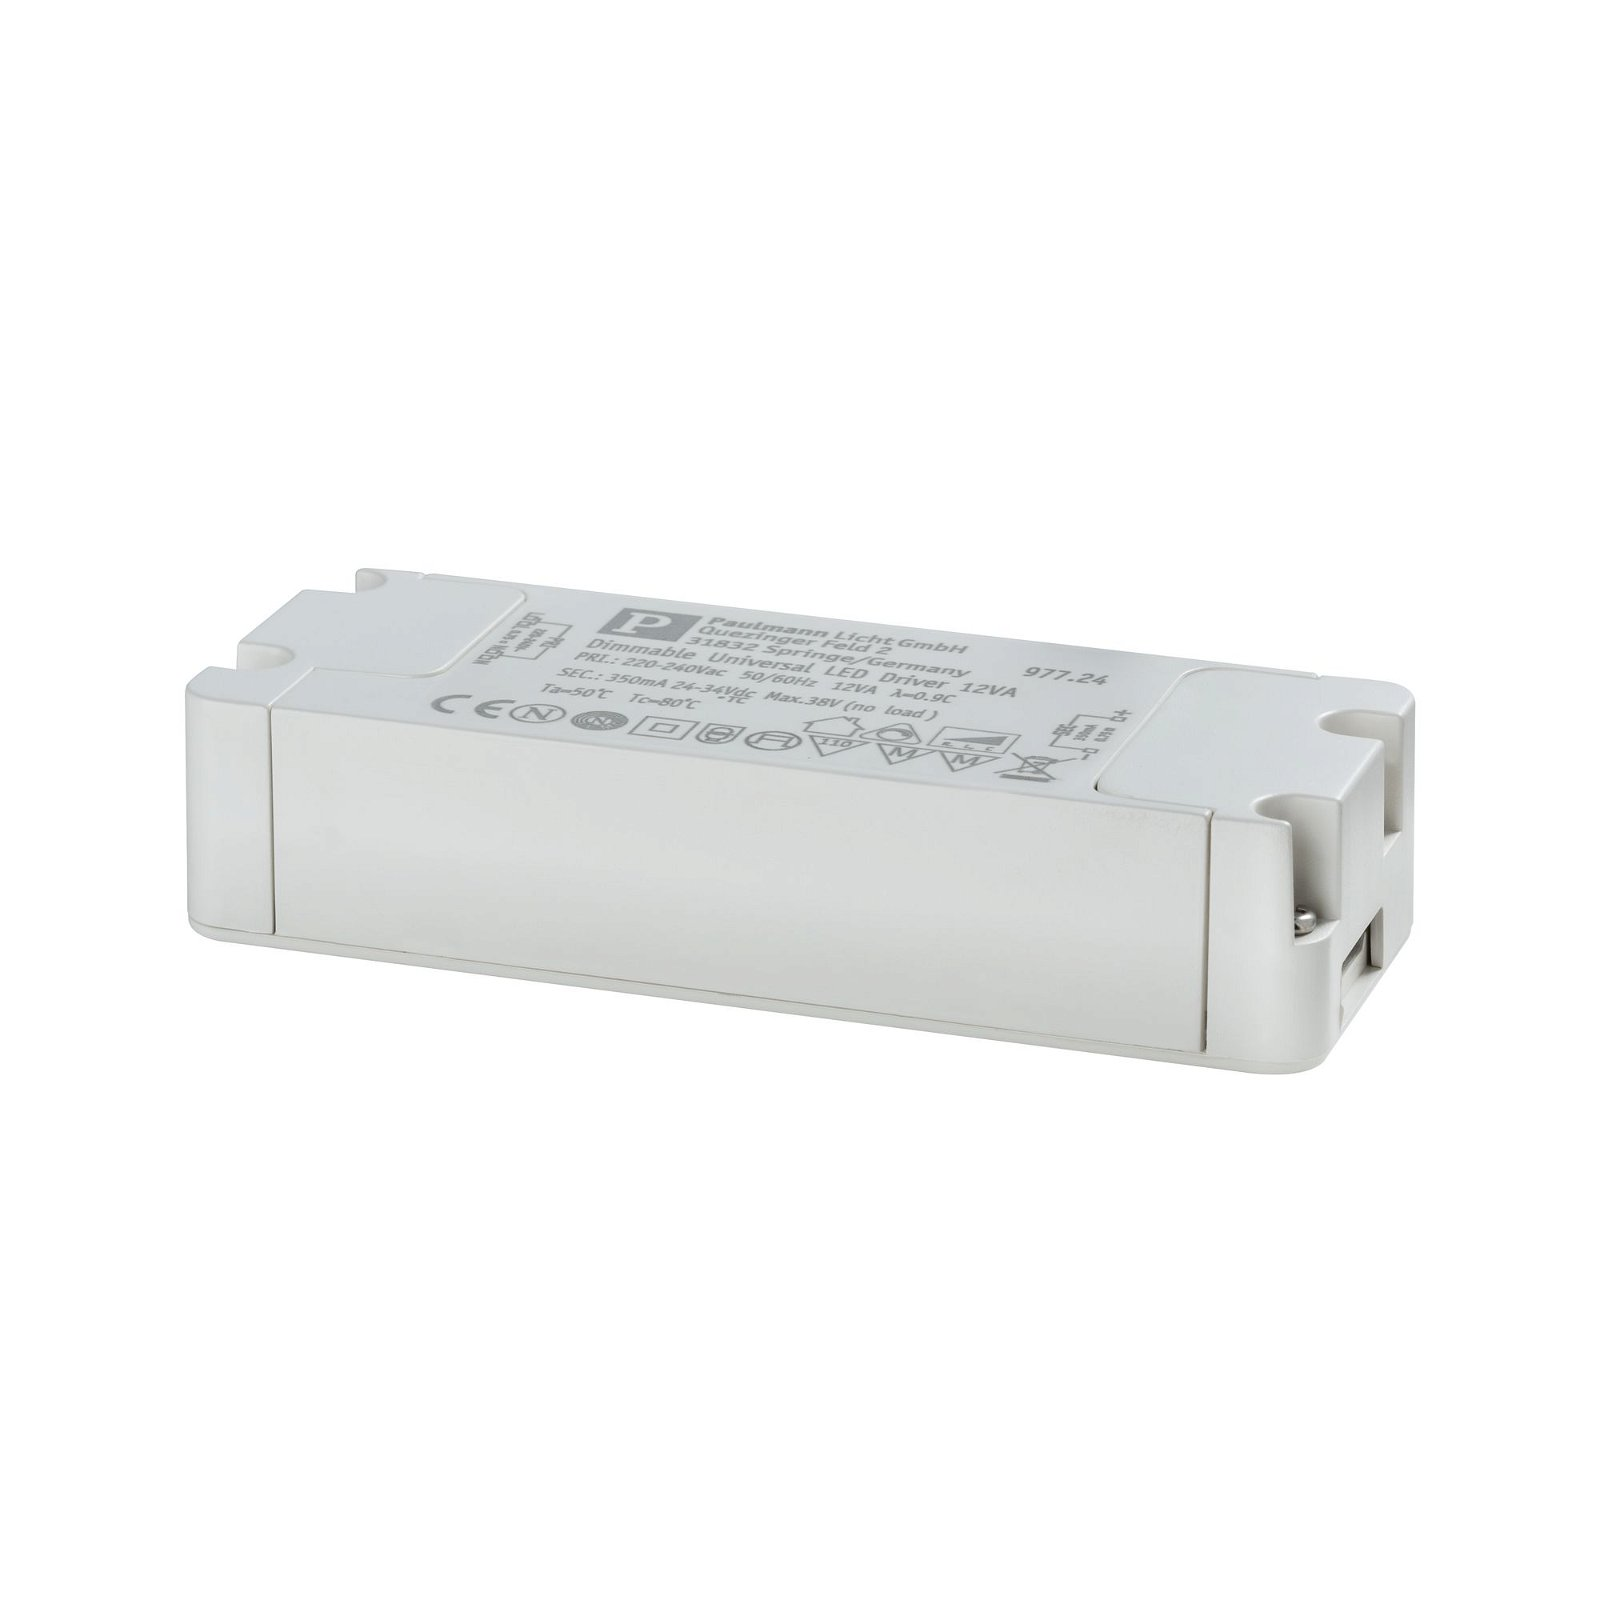 LED Driver Konstantstrom 230V 8-12VA Weiß